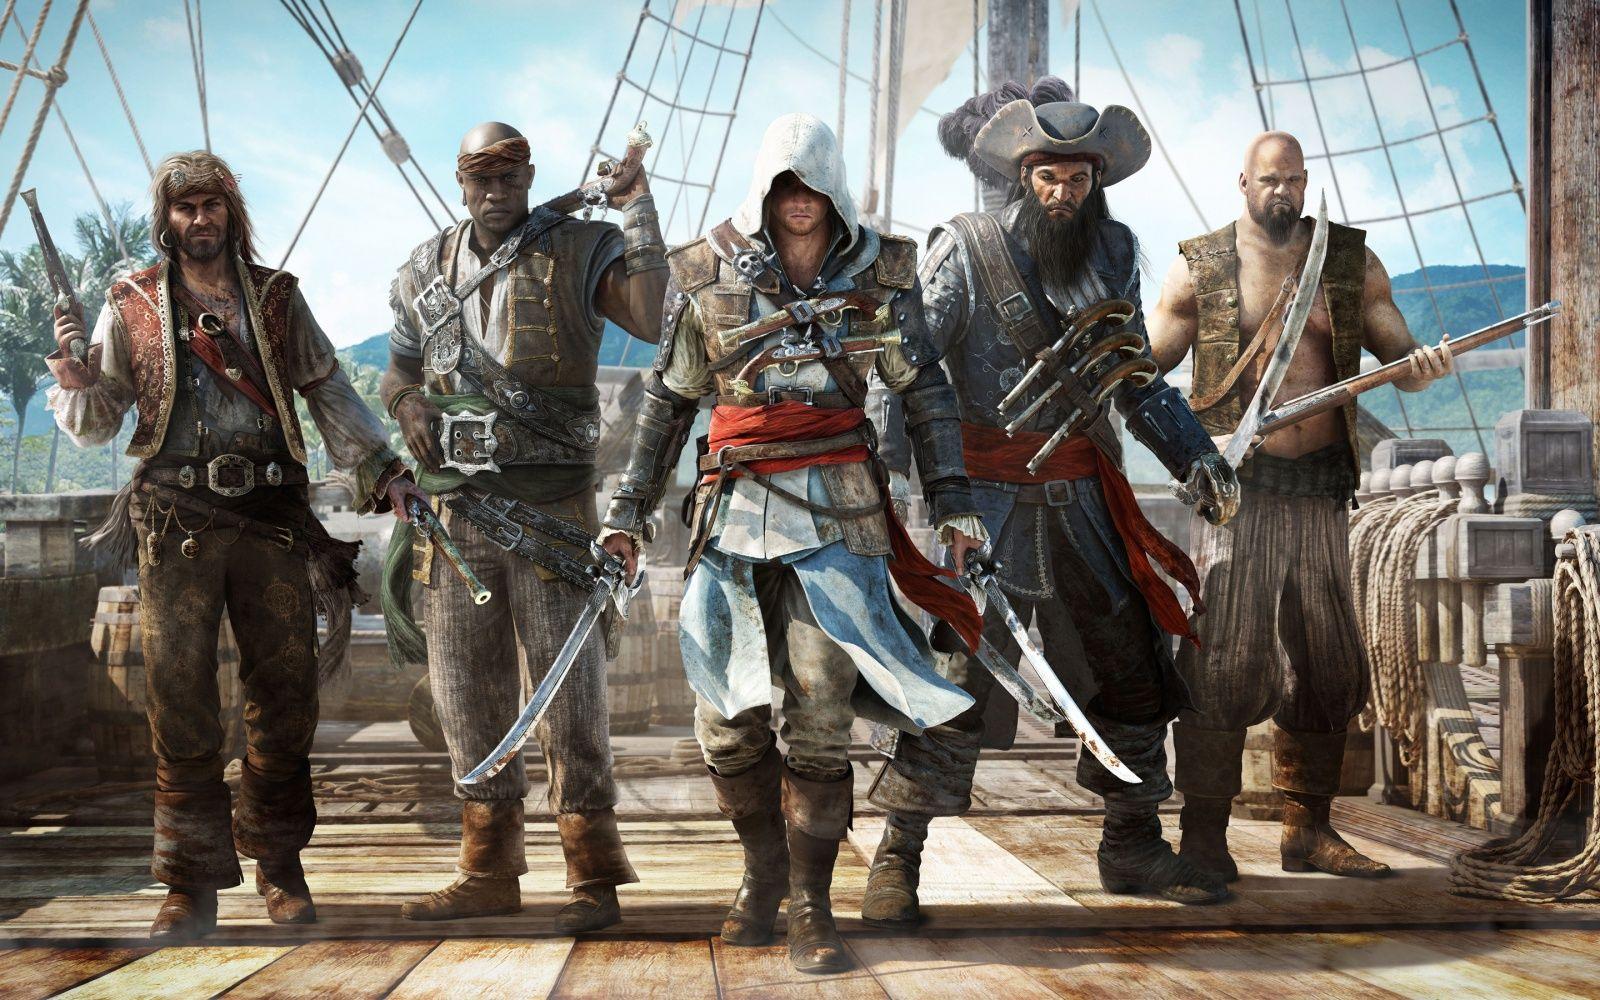 Pirates stories